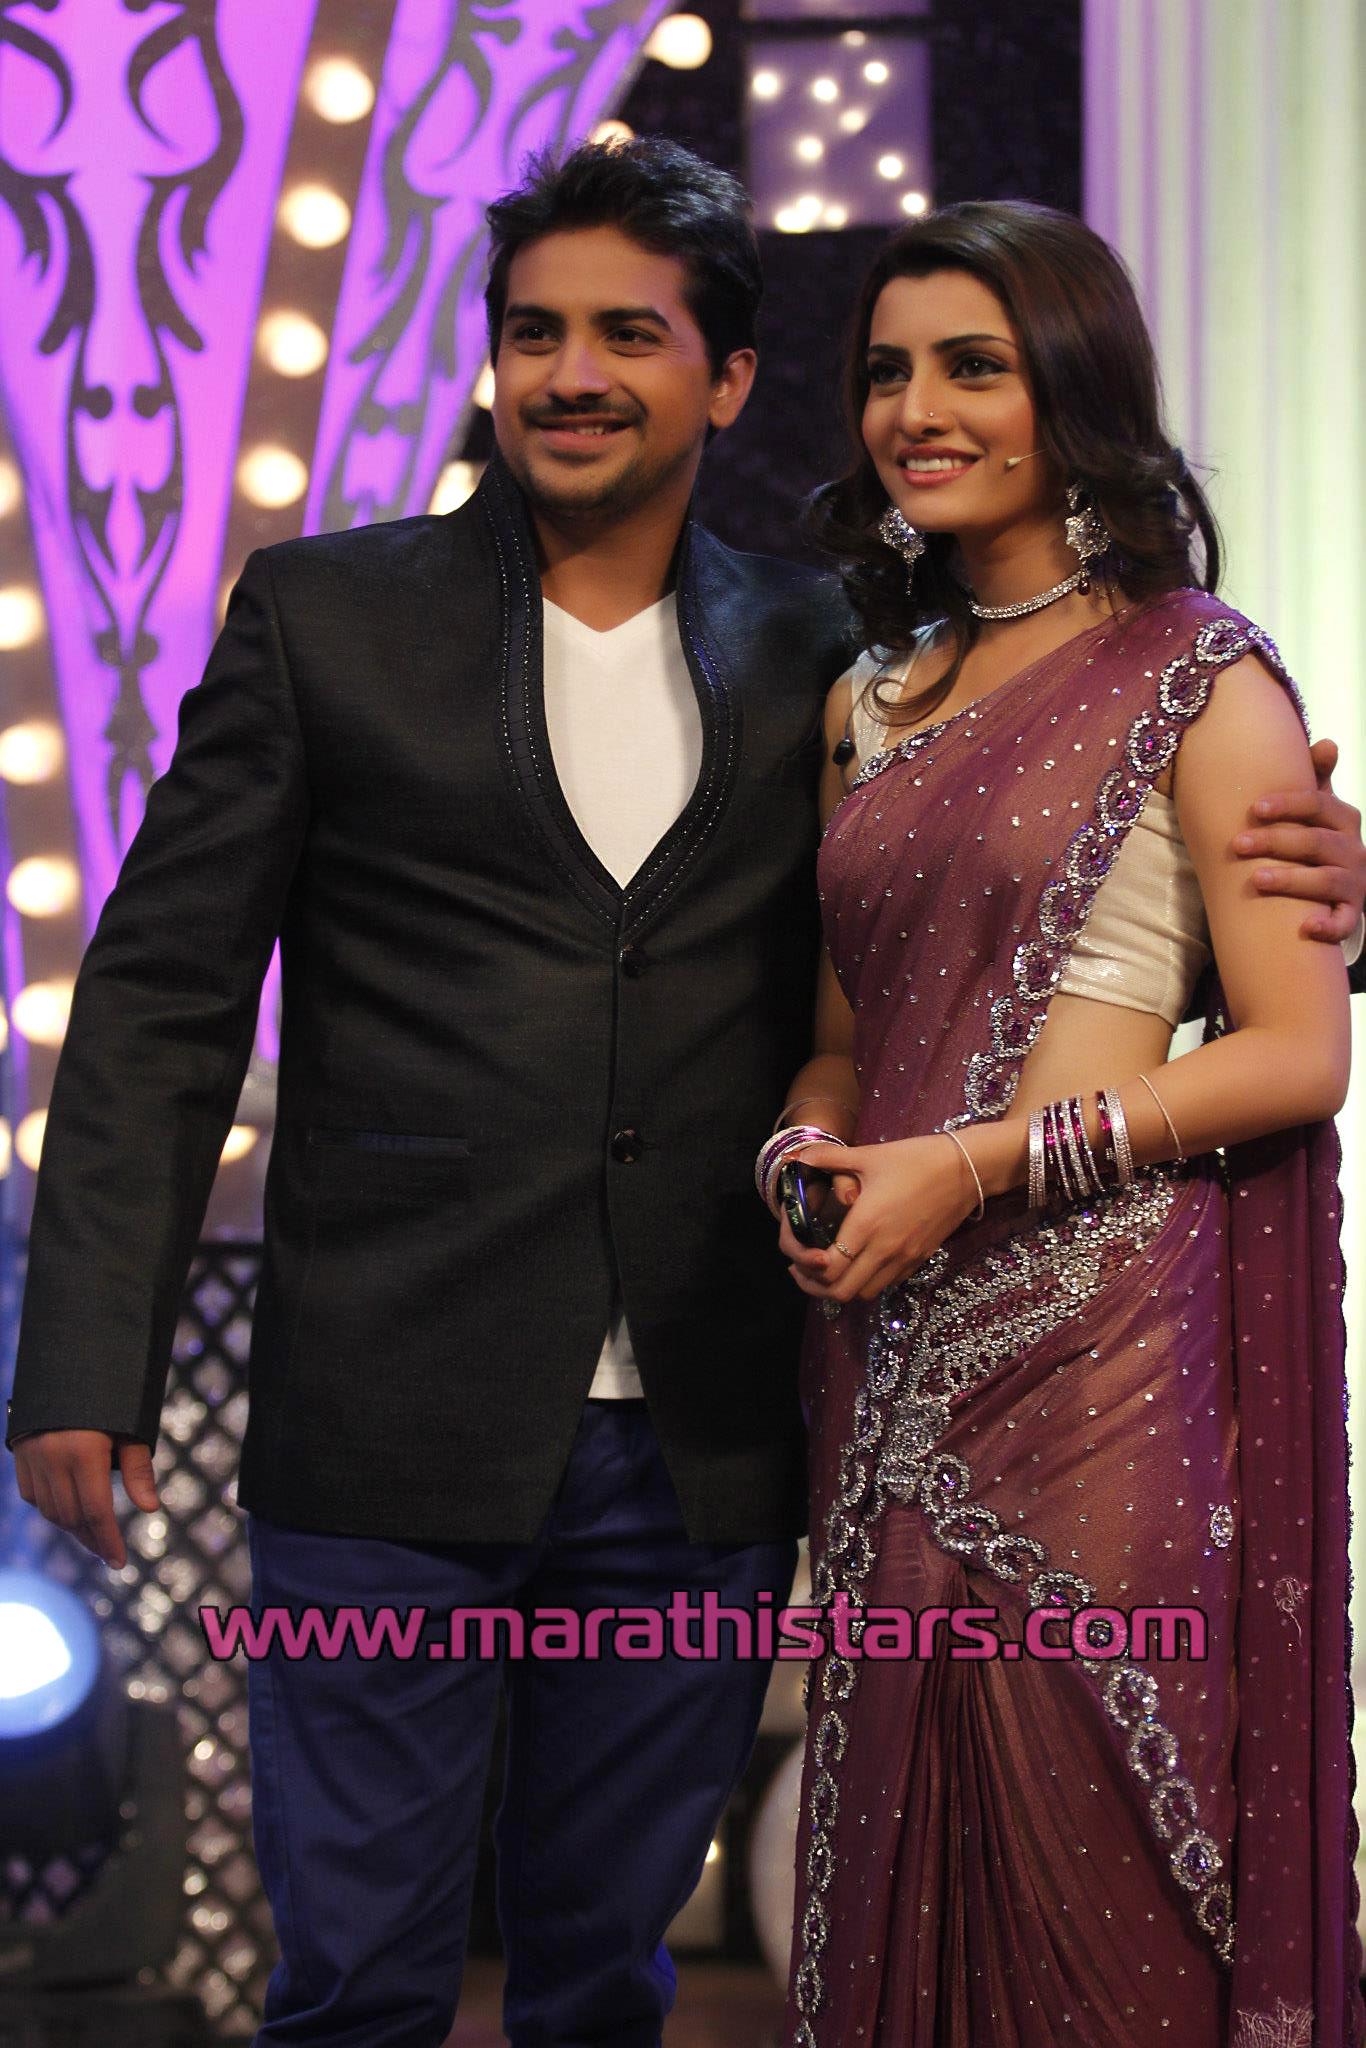 Poorvi Bhave Marathi Actress Photos, Biography - MarathiStars